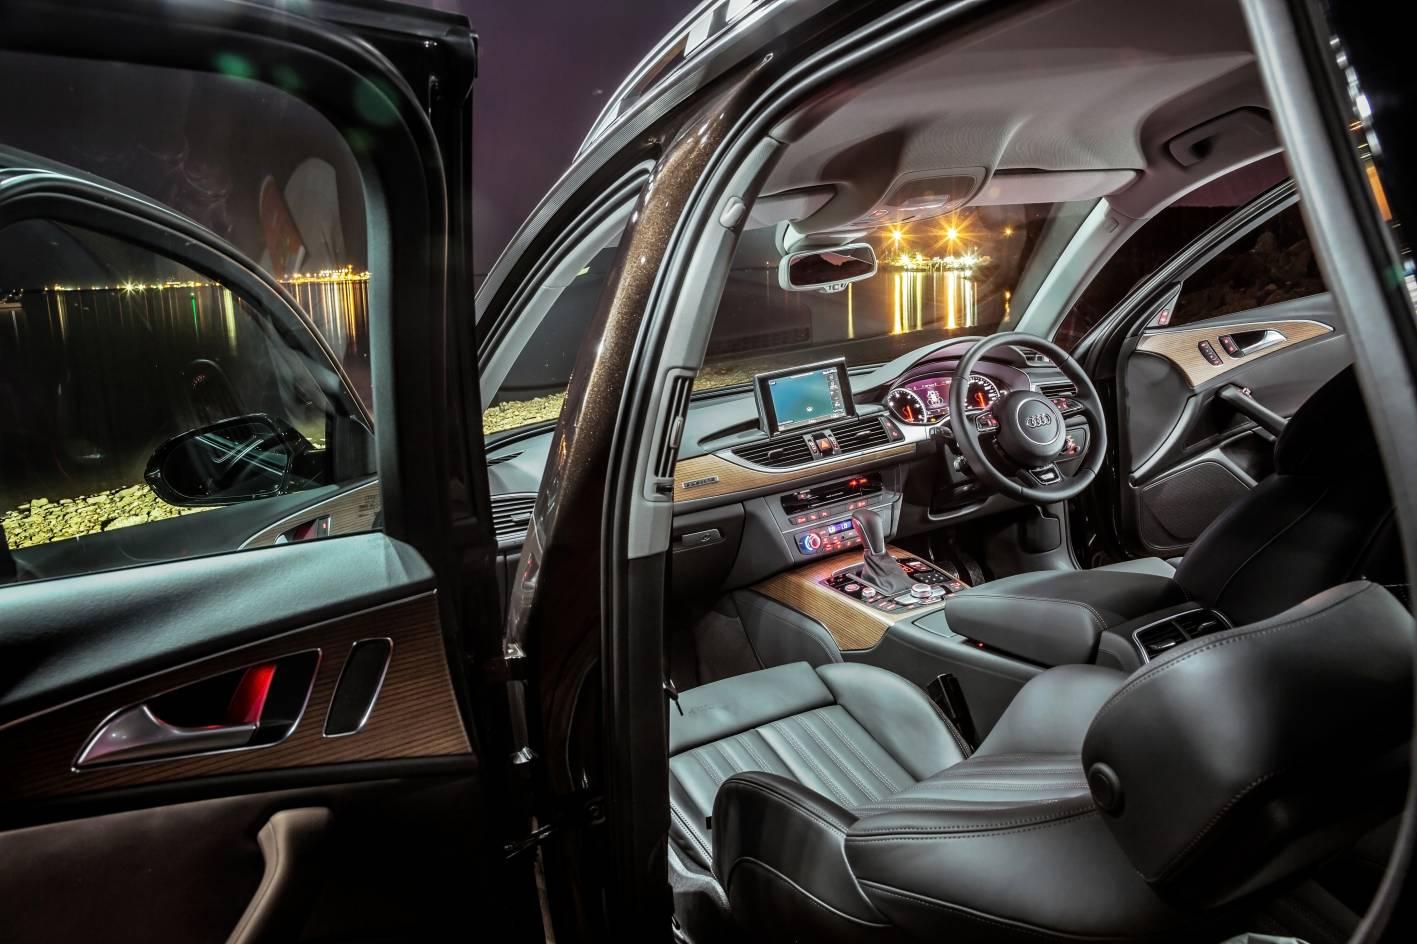 2015 audi a6 allroad on sale in australia from 111 900 performancedrive. Black Bedroom Furniture Sets. Home Design Ideas